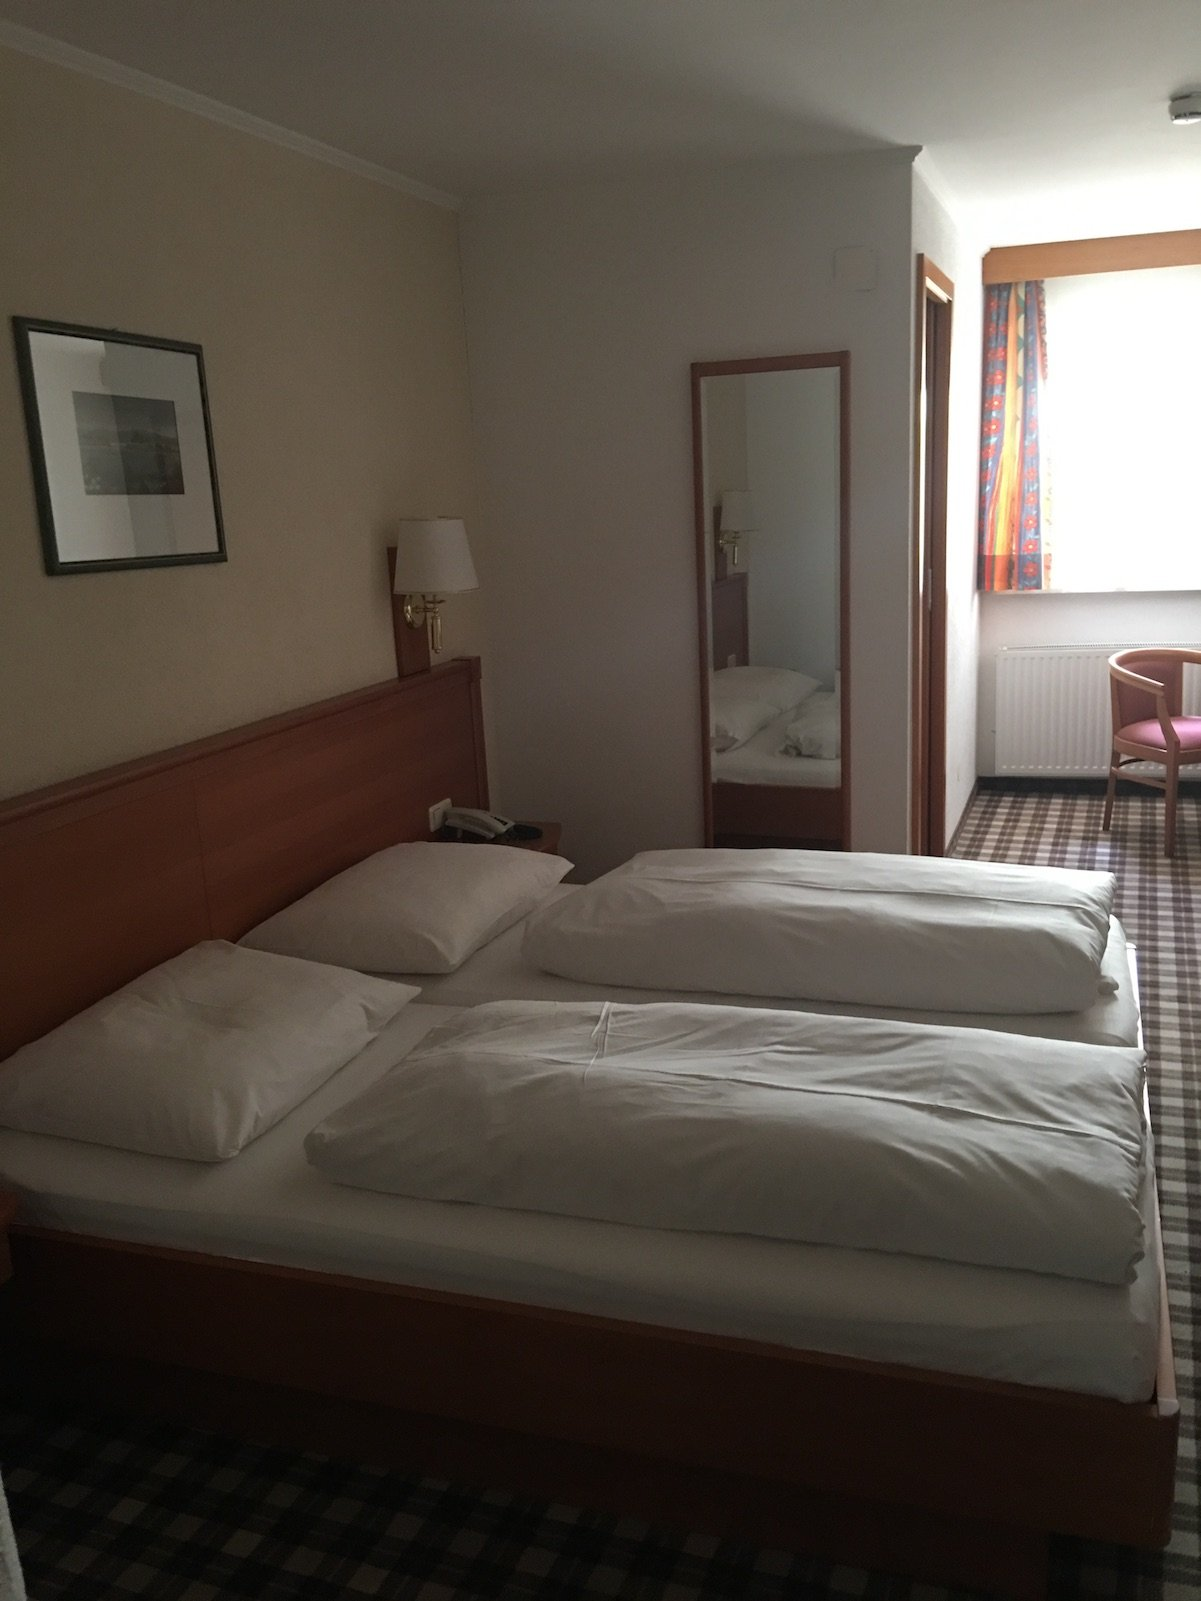 Blick ins Zimmer im Hotel Mohren in Reutte